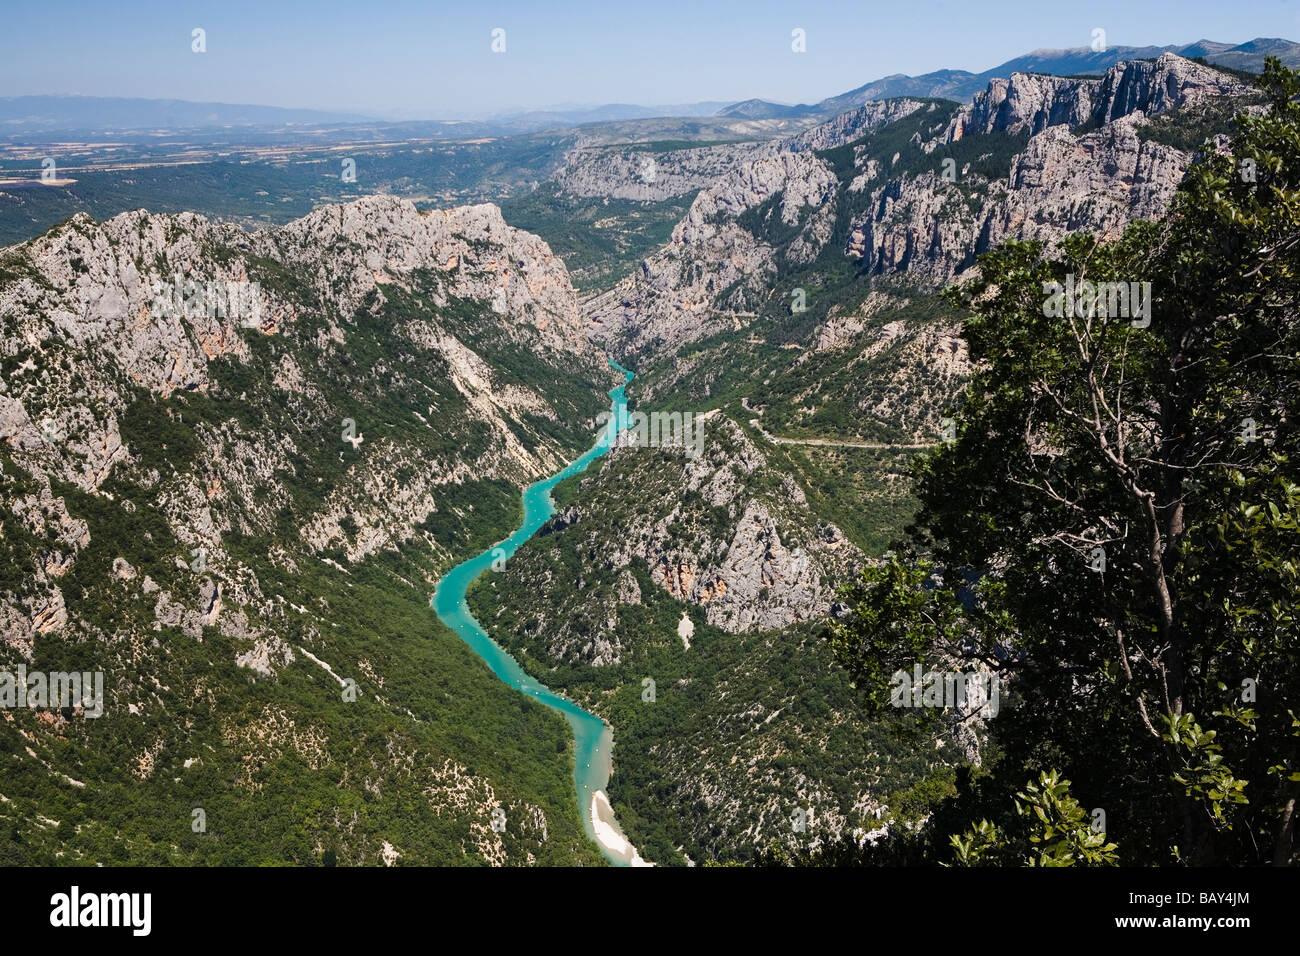 Grand Canyon du Verdon, view at the canyon and the river Verdon, Alpes-de-Haute-Provence, Provence, France - Stock Image